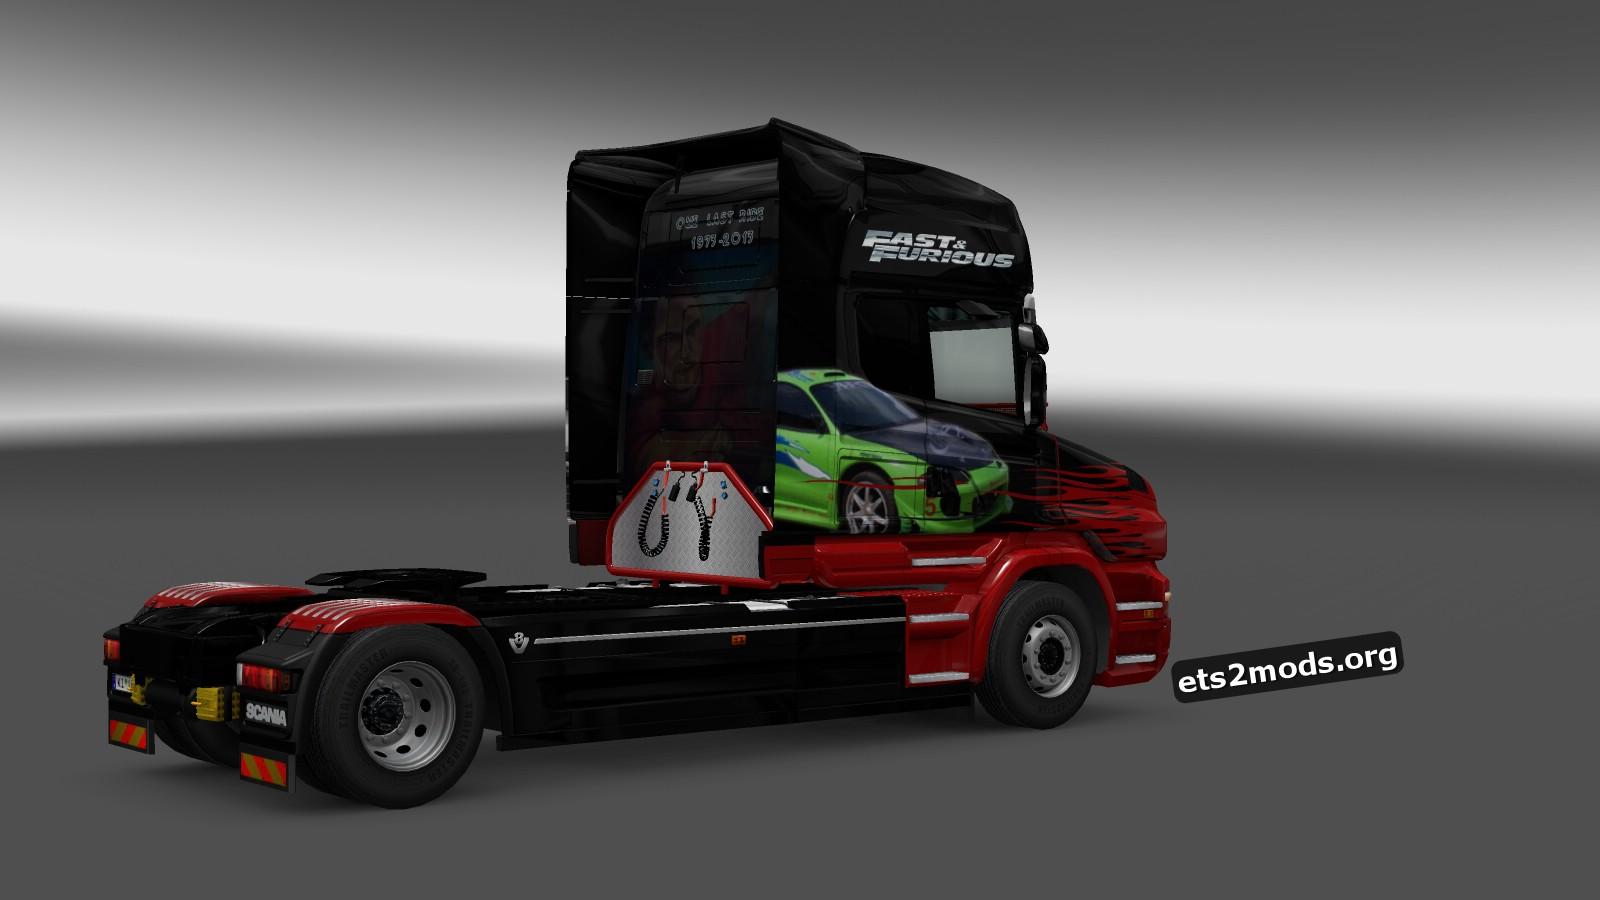 Scania T One Last Ride Skin